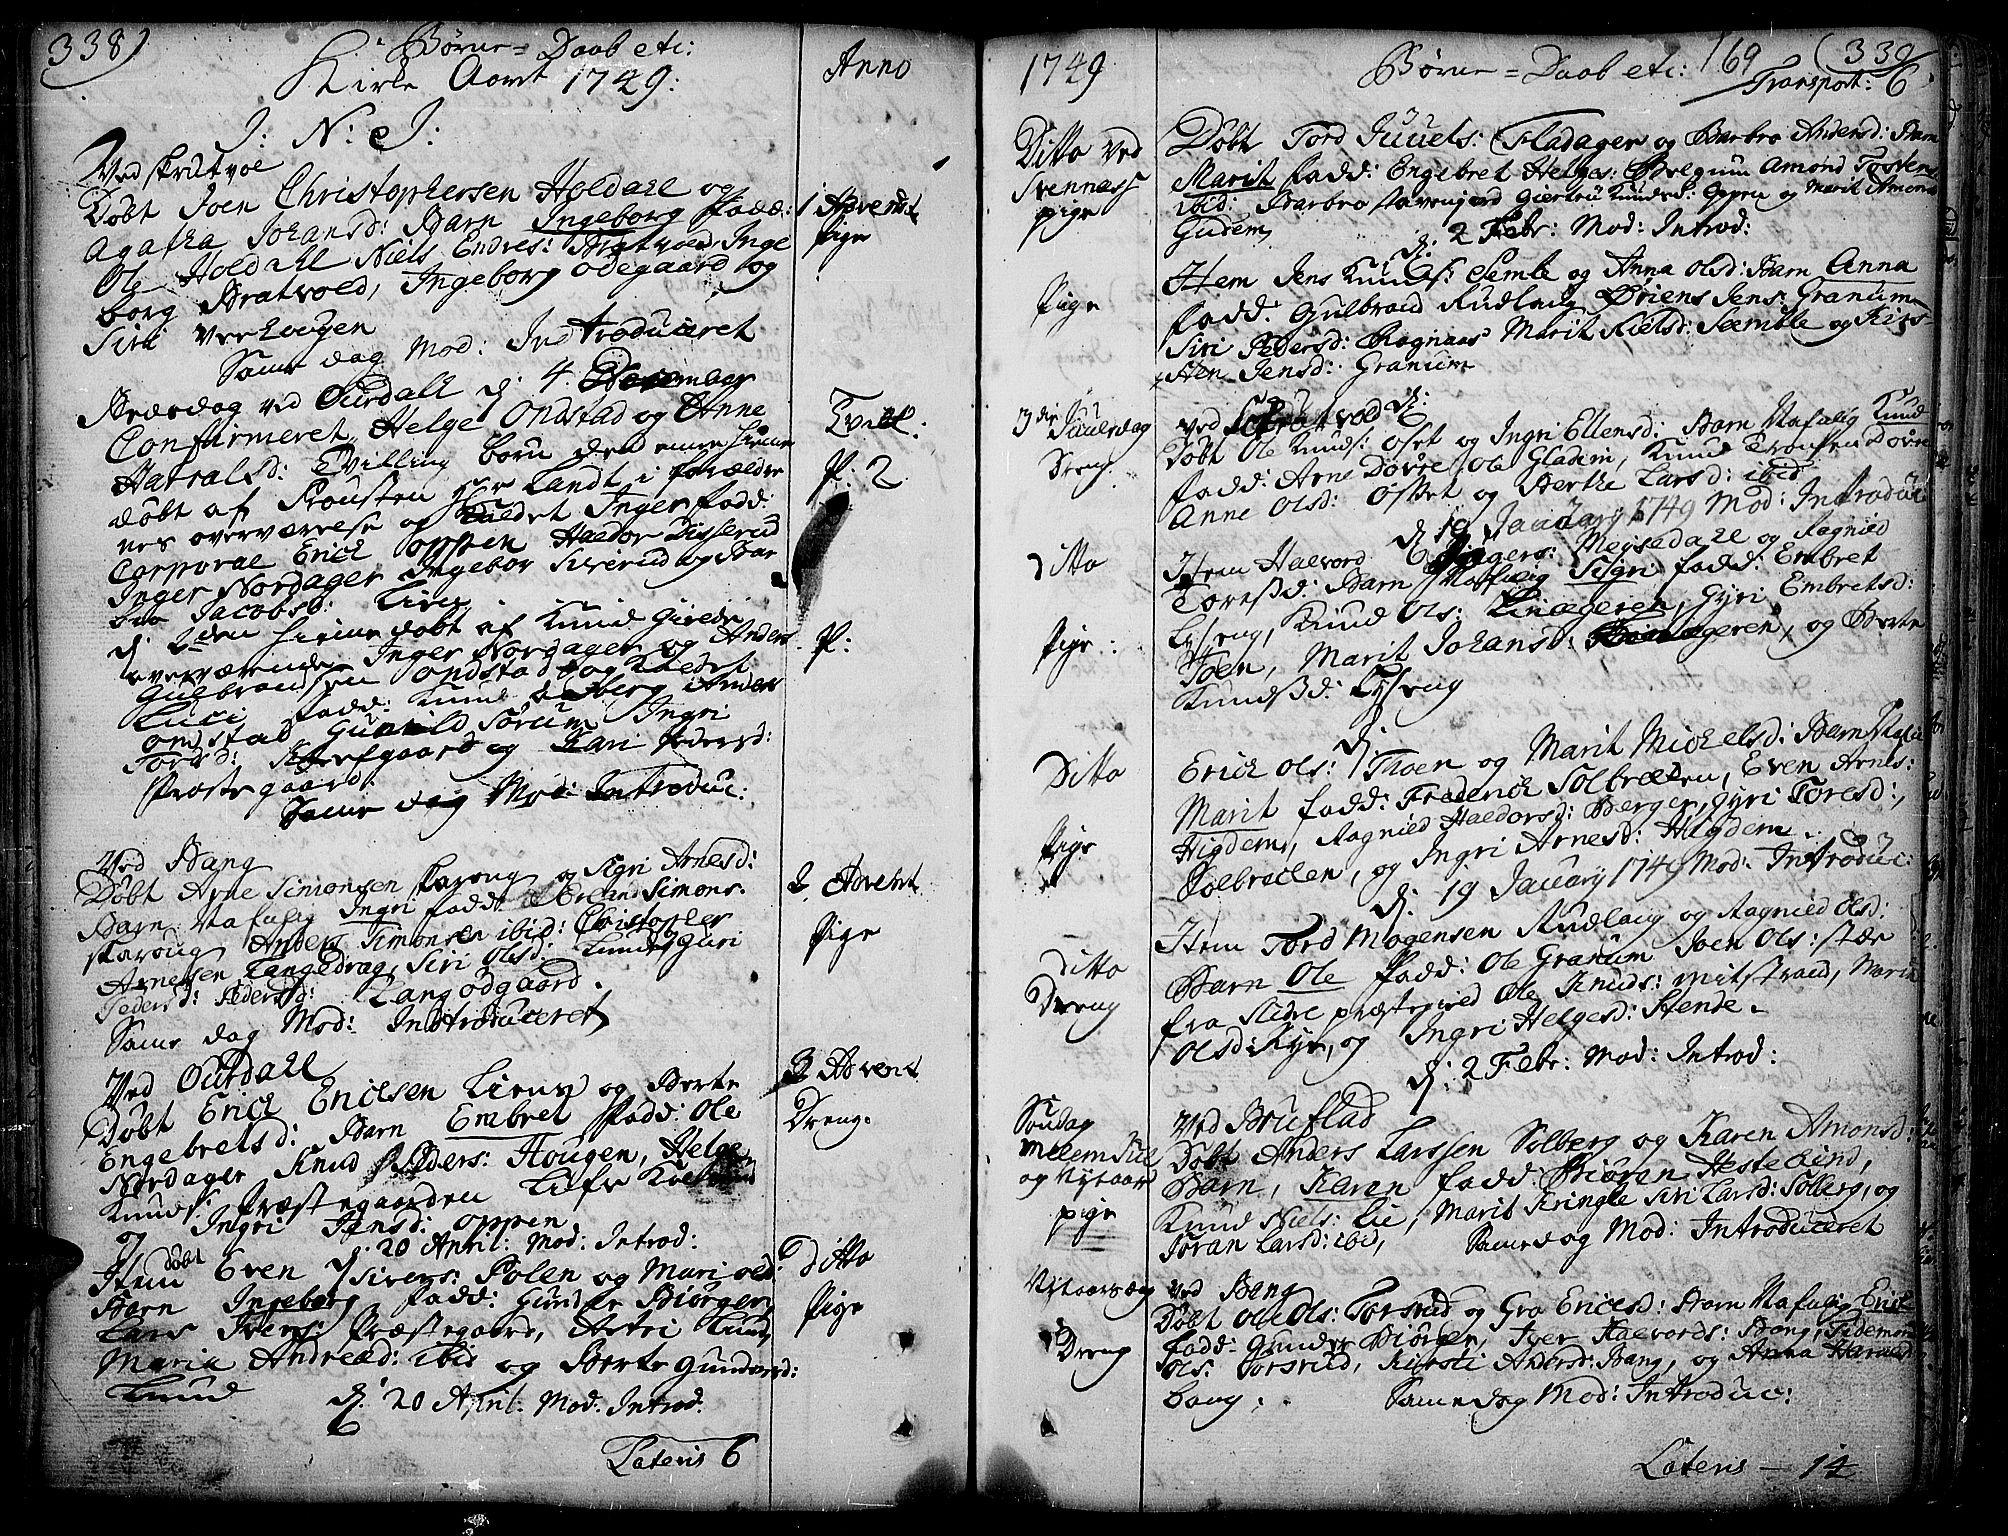 SAH, Aurdal prestekontor, Ministerialbok nr. 4, 1730-1762, s. 338-339